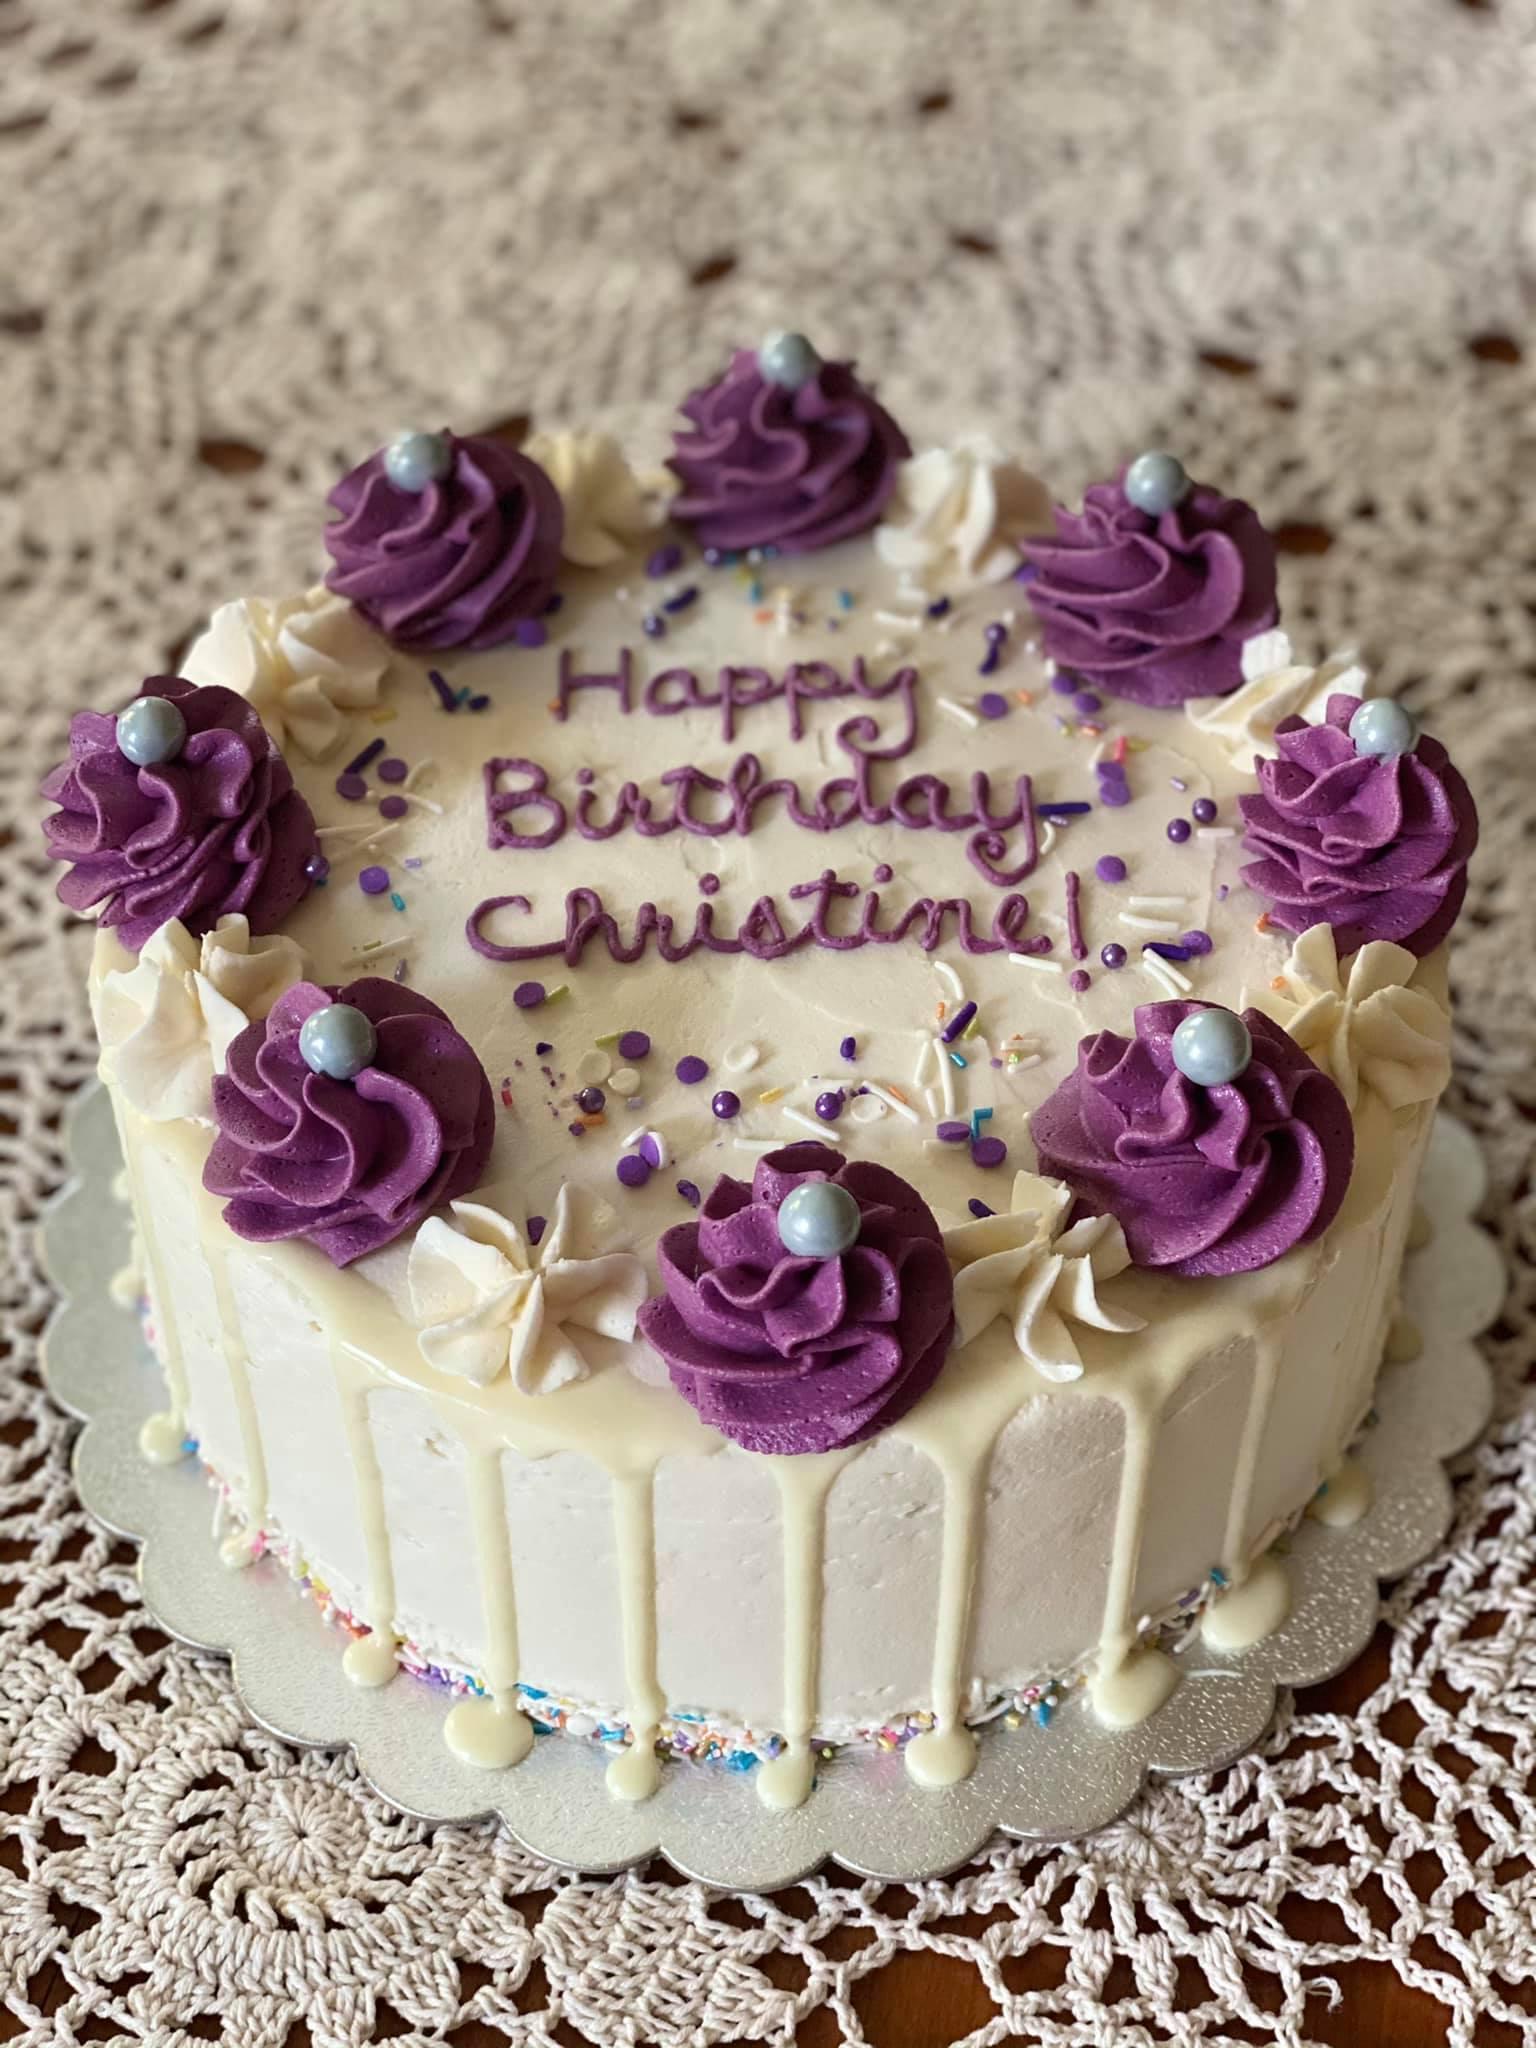 hbd purple cake.jpg